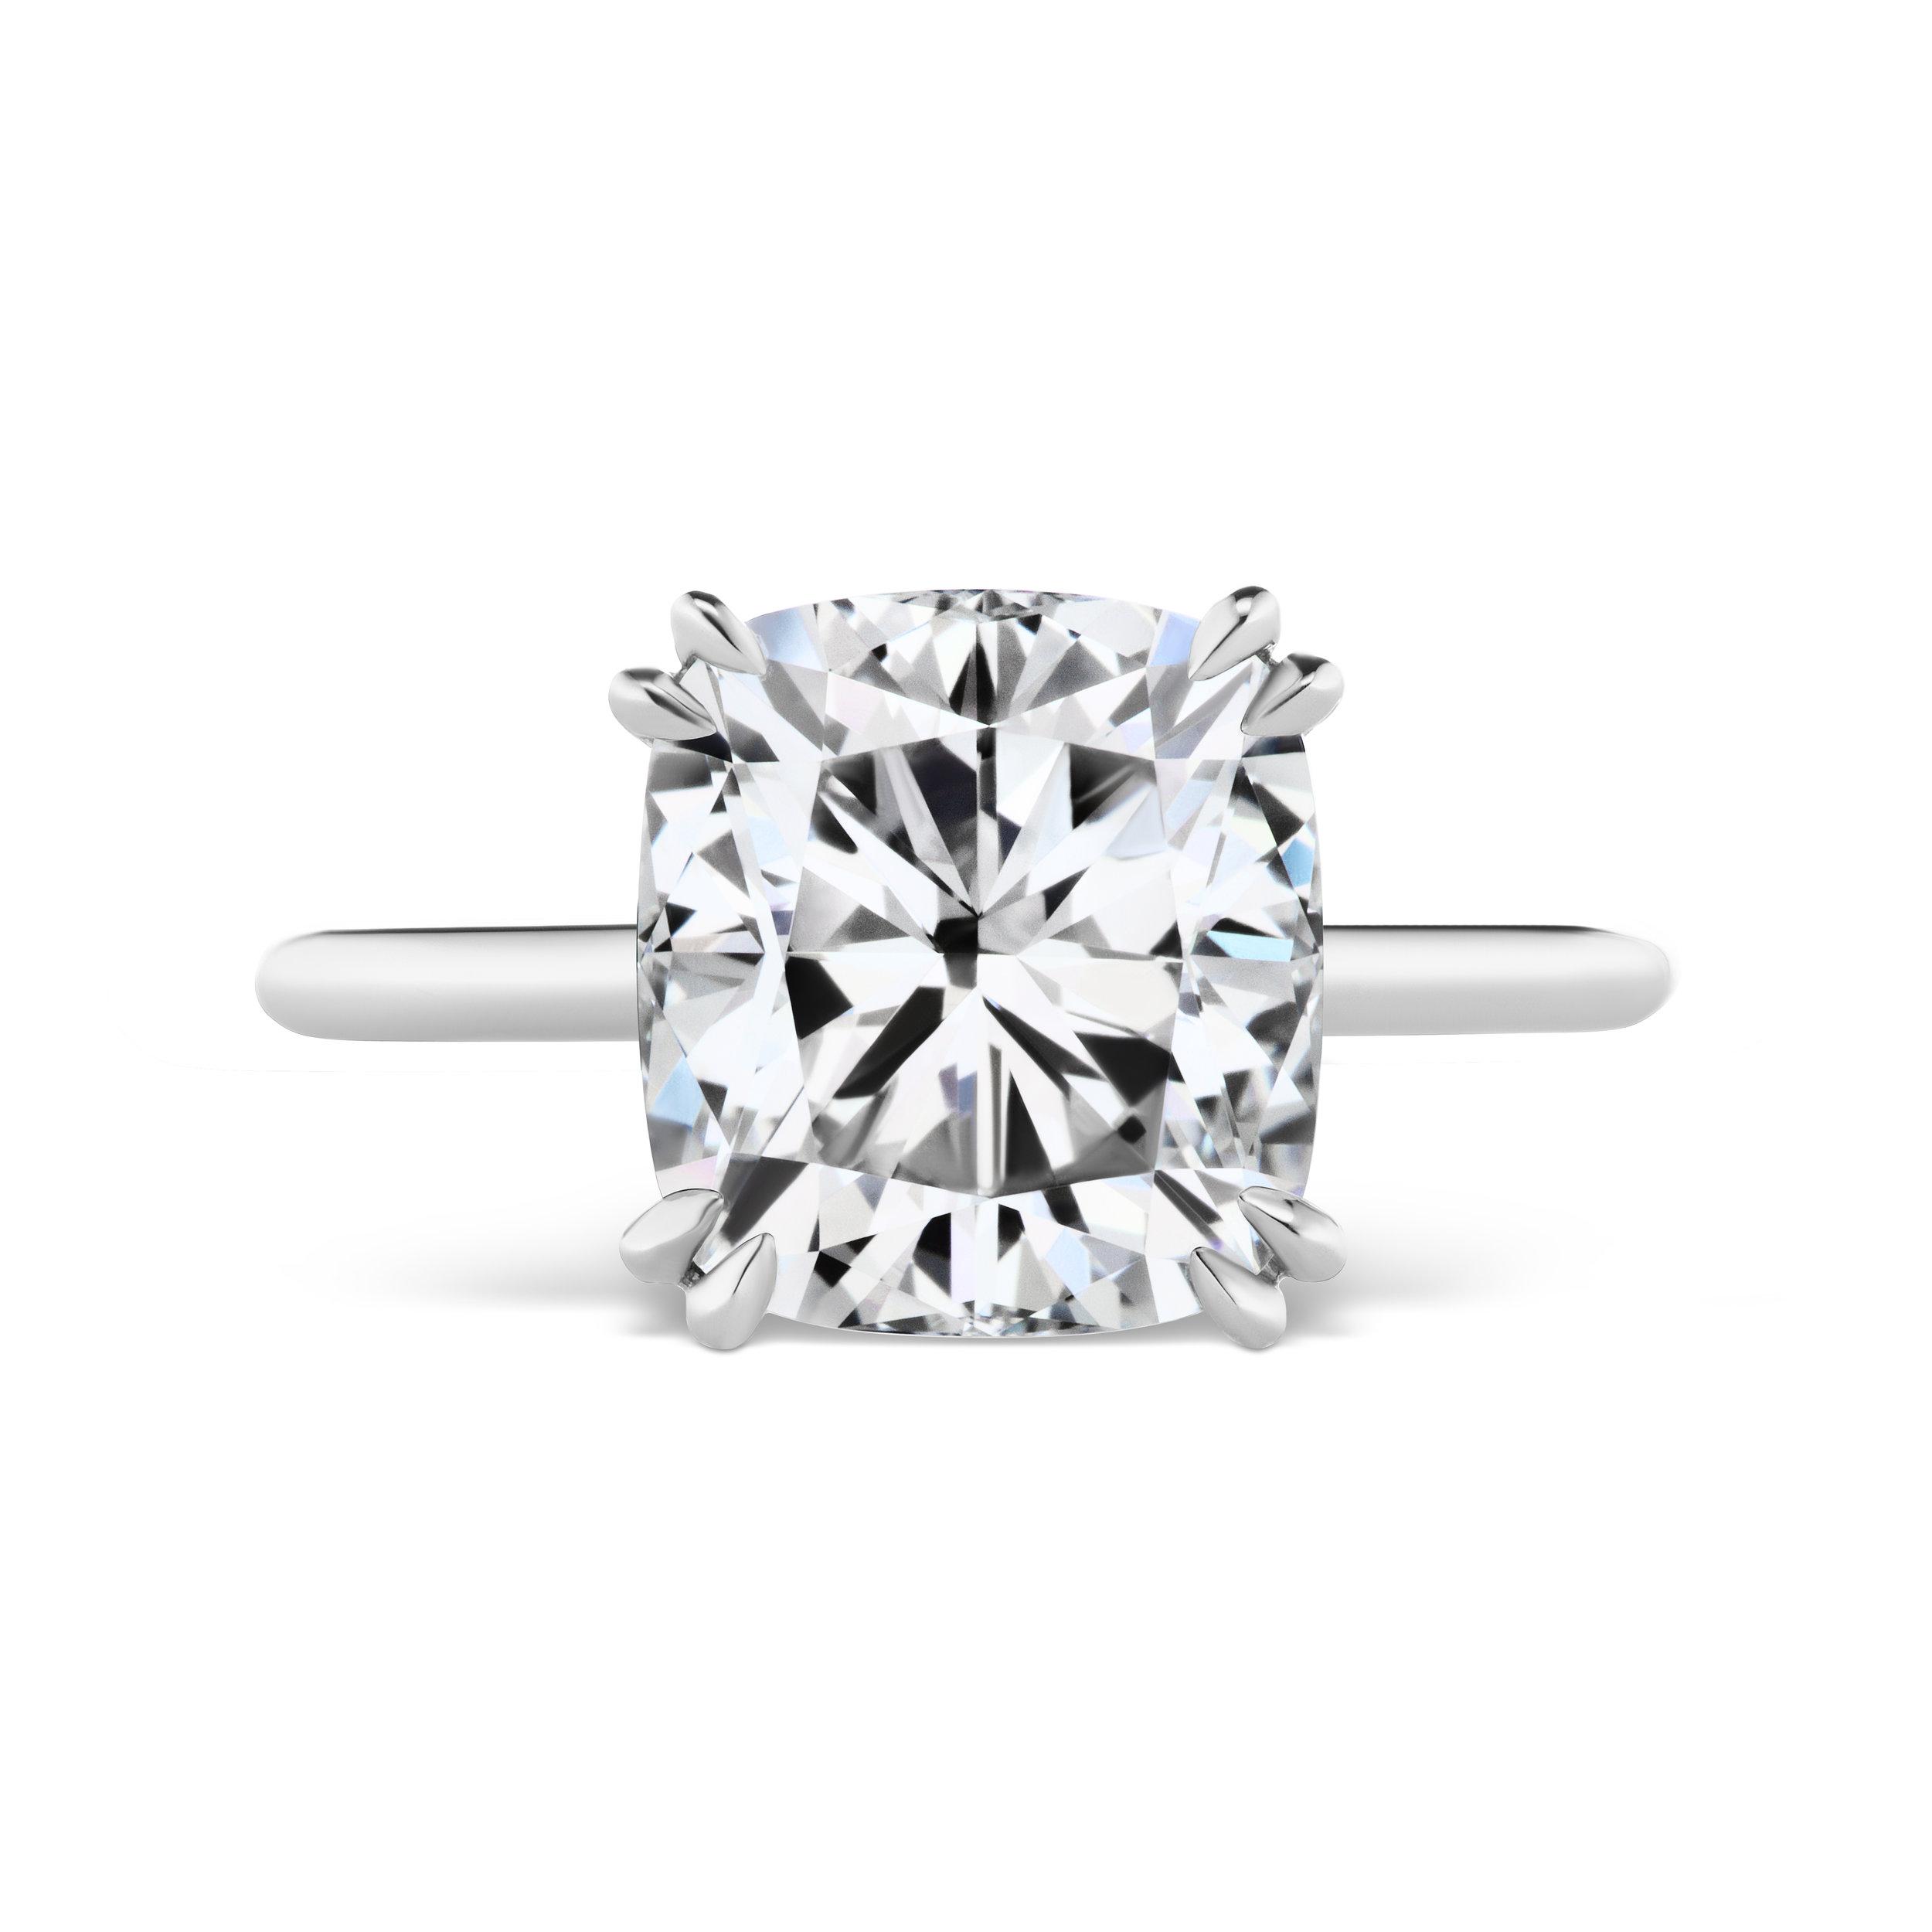 Cushion cut diamond ring, mounted in platinum.